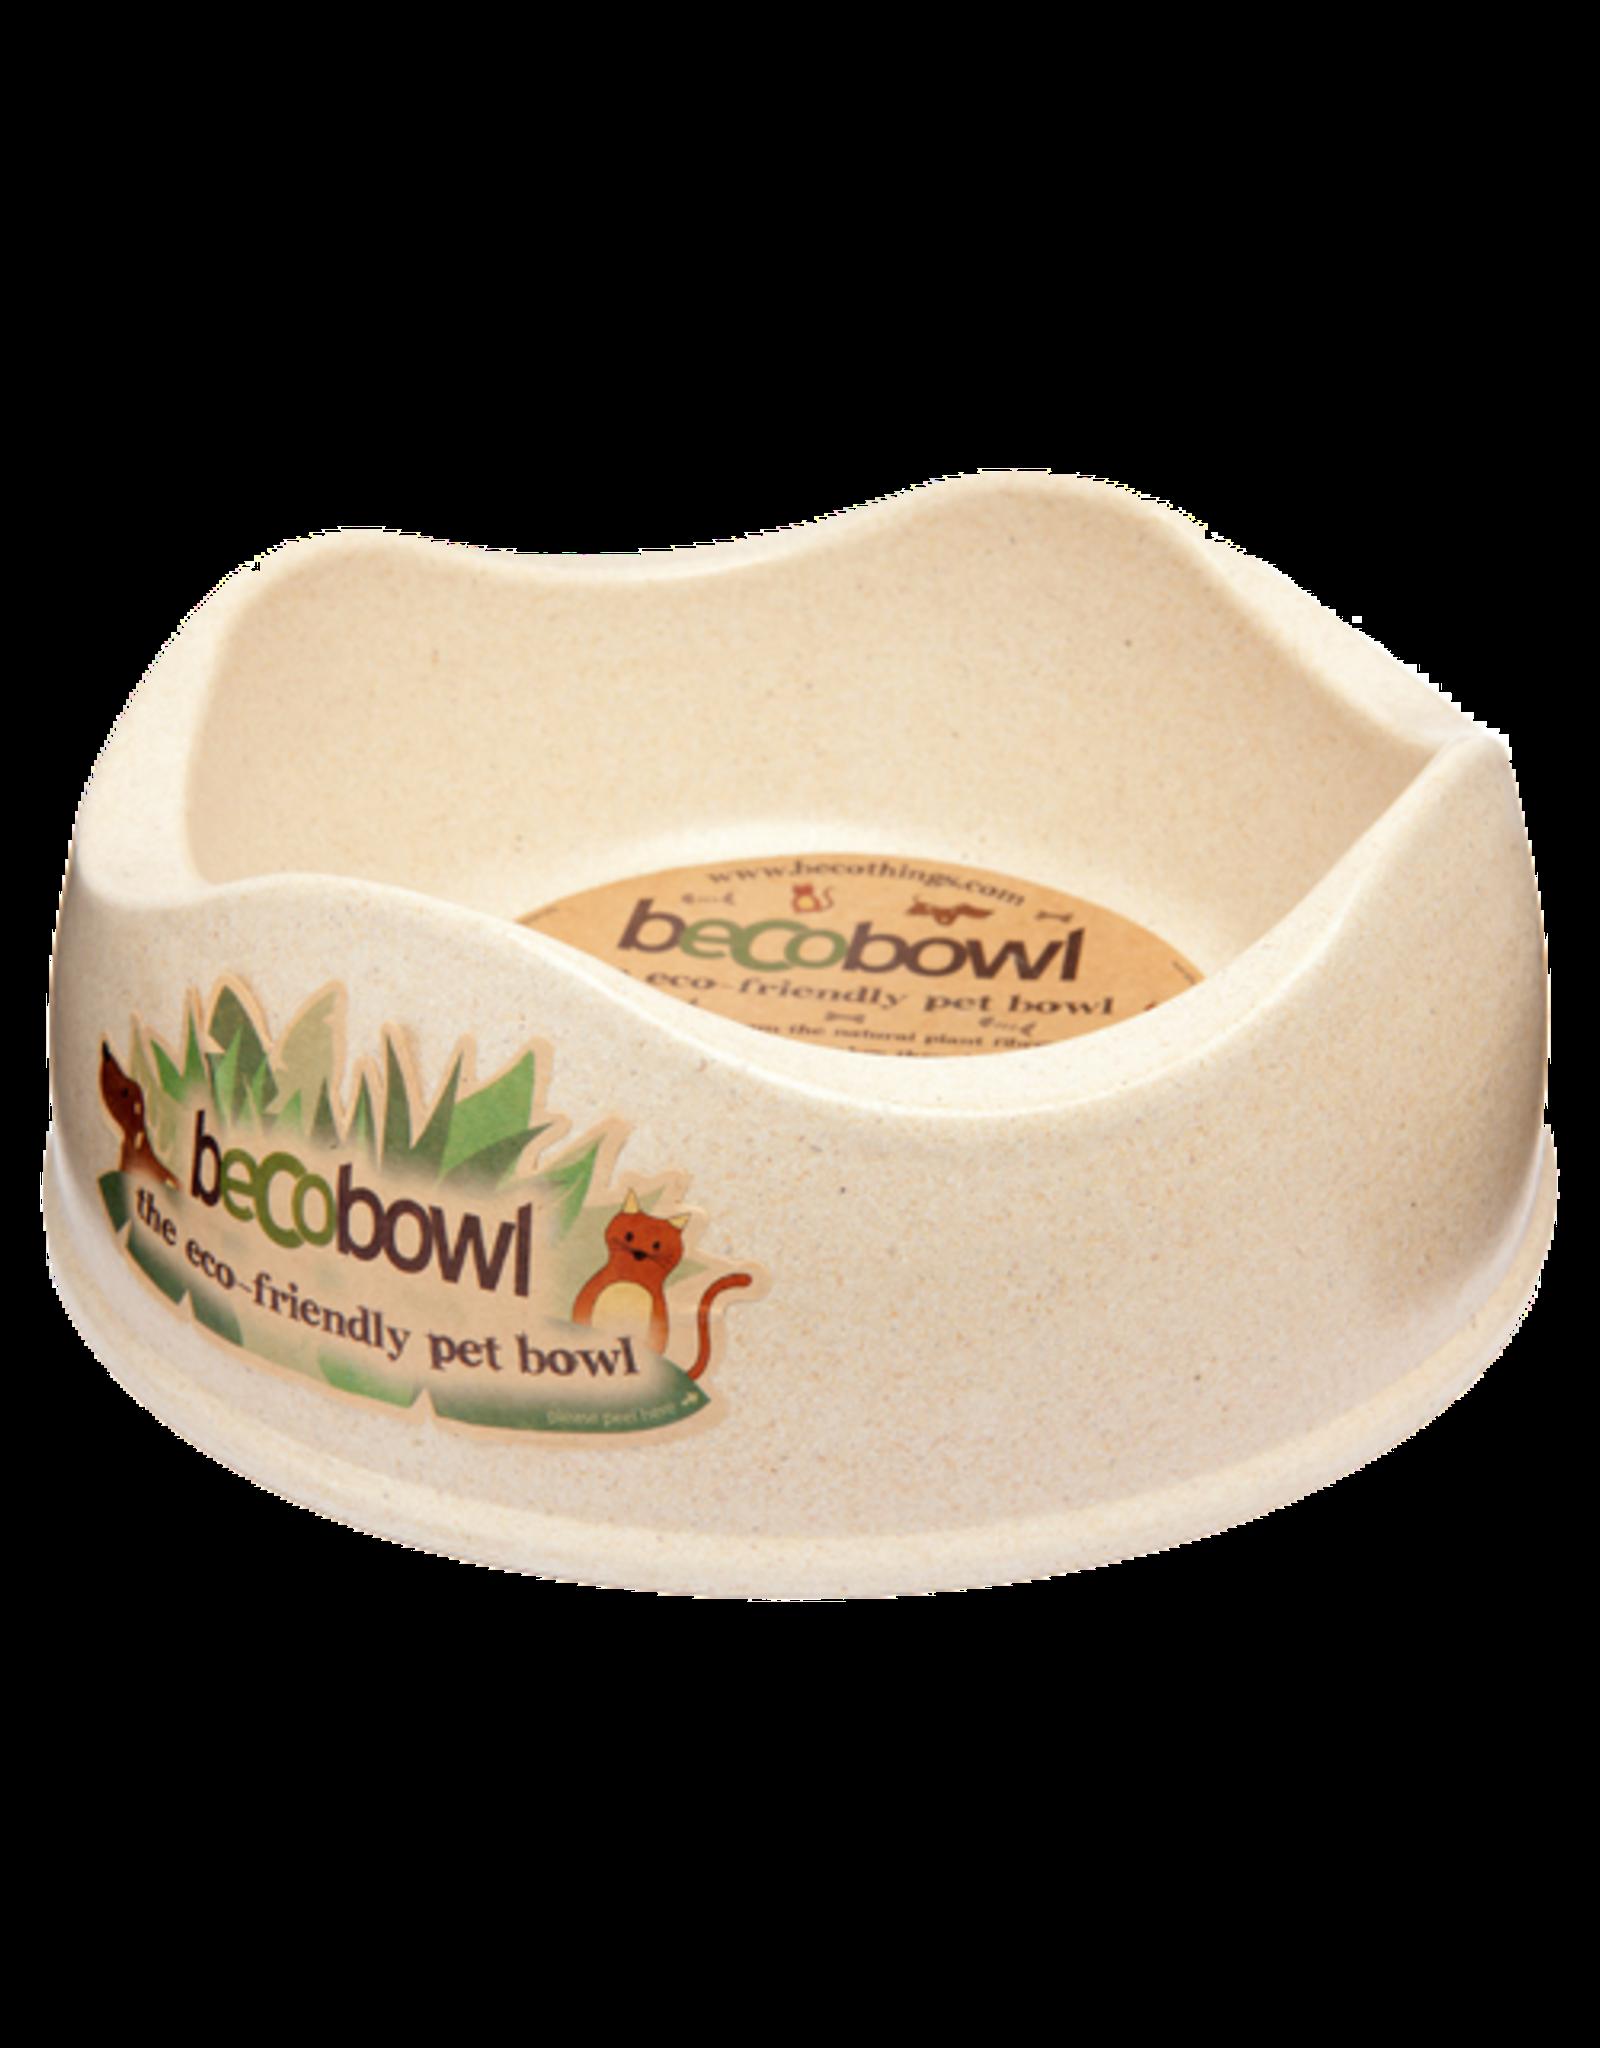 Large Beco Bowl Nt 1.5L dog